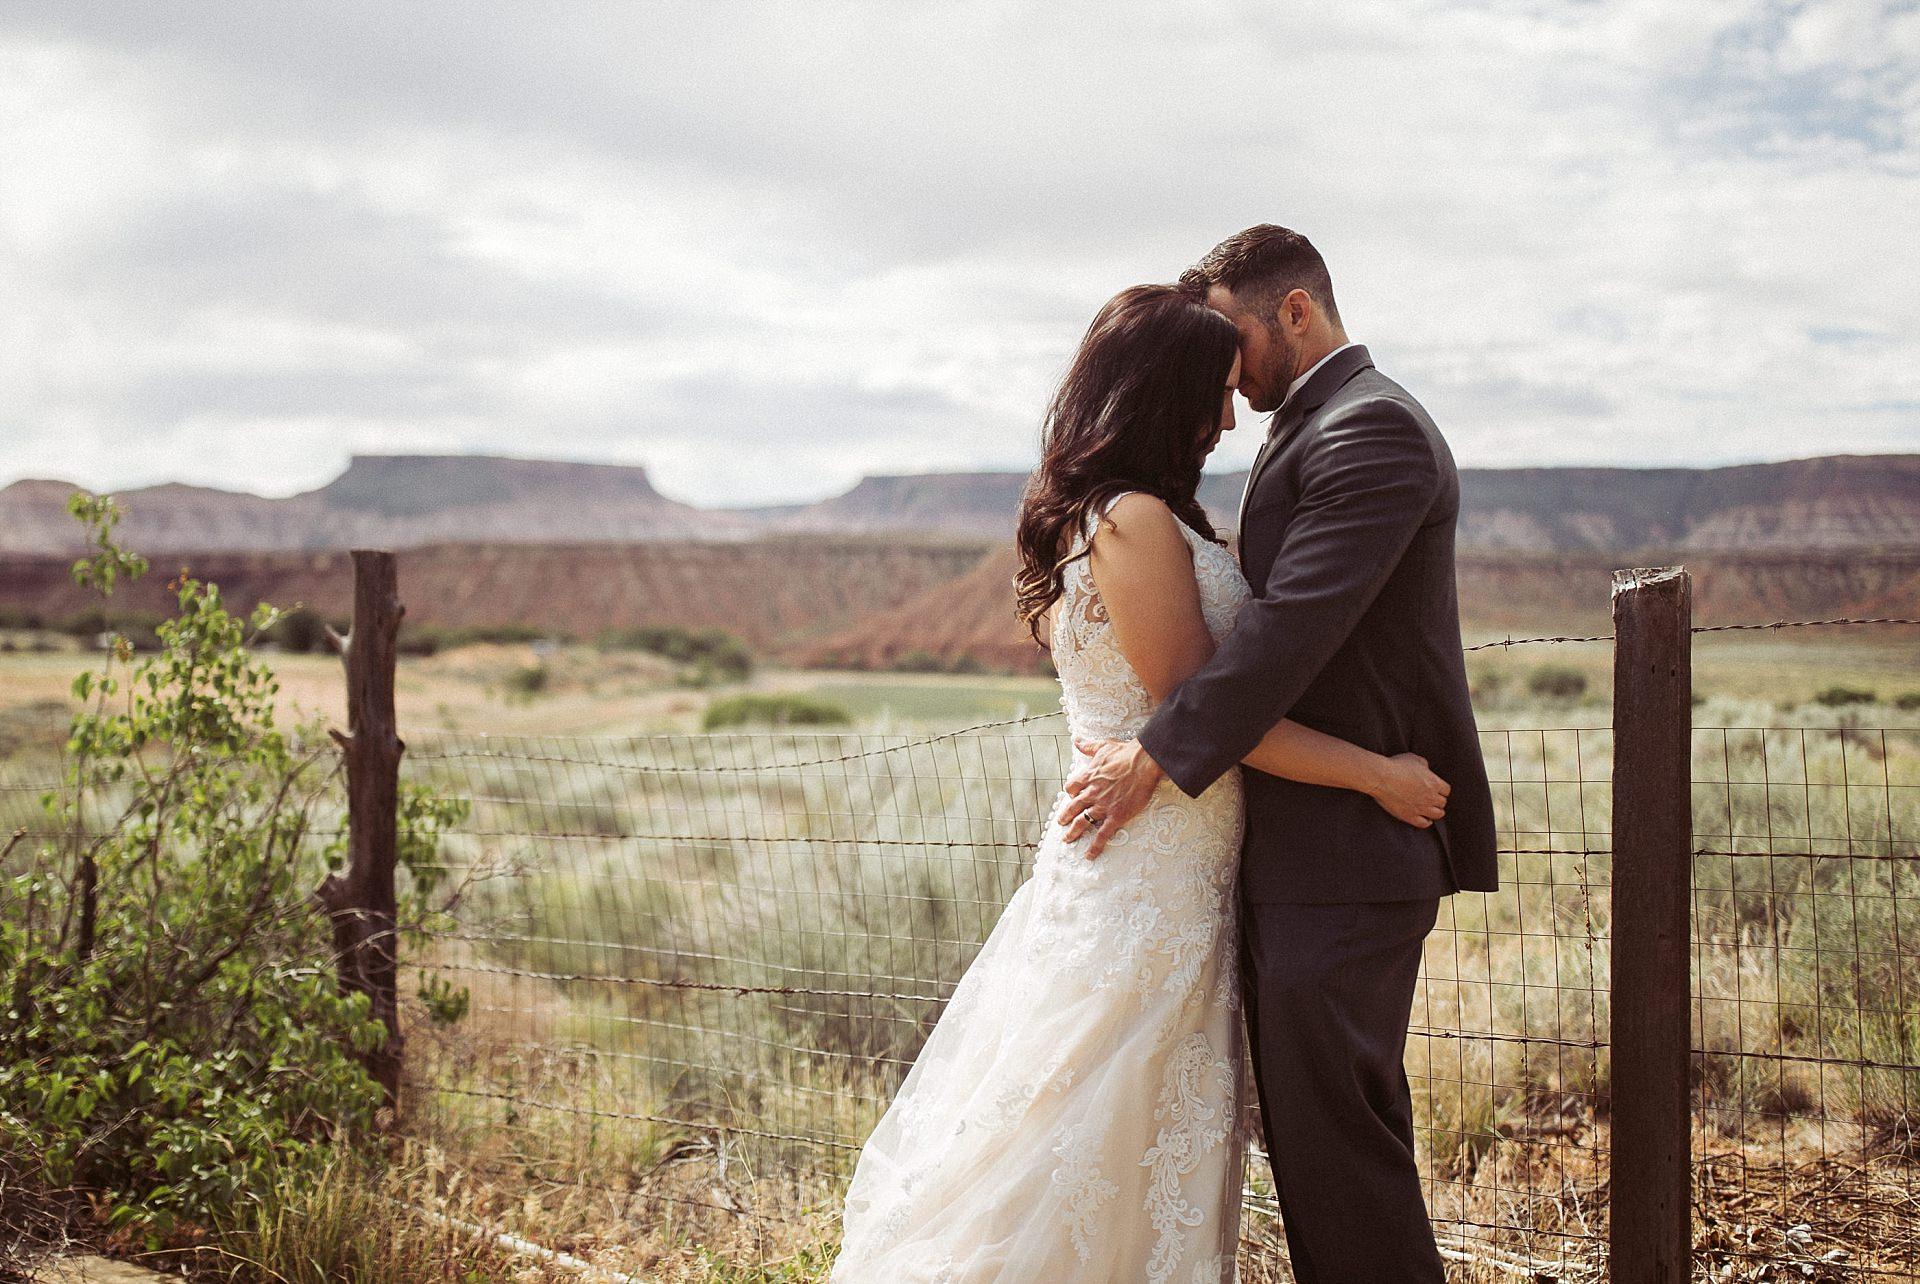 Hicks-Zion-National-Park-Wedding-0001.jpg